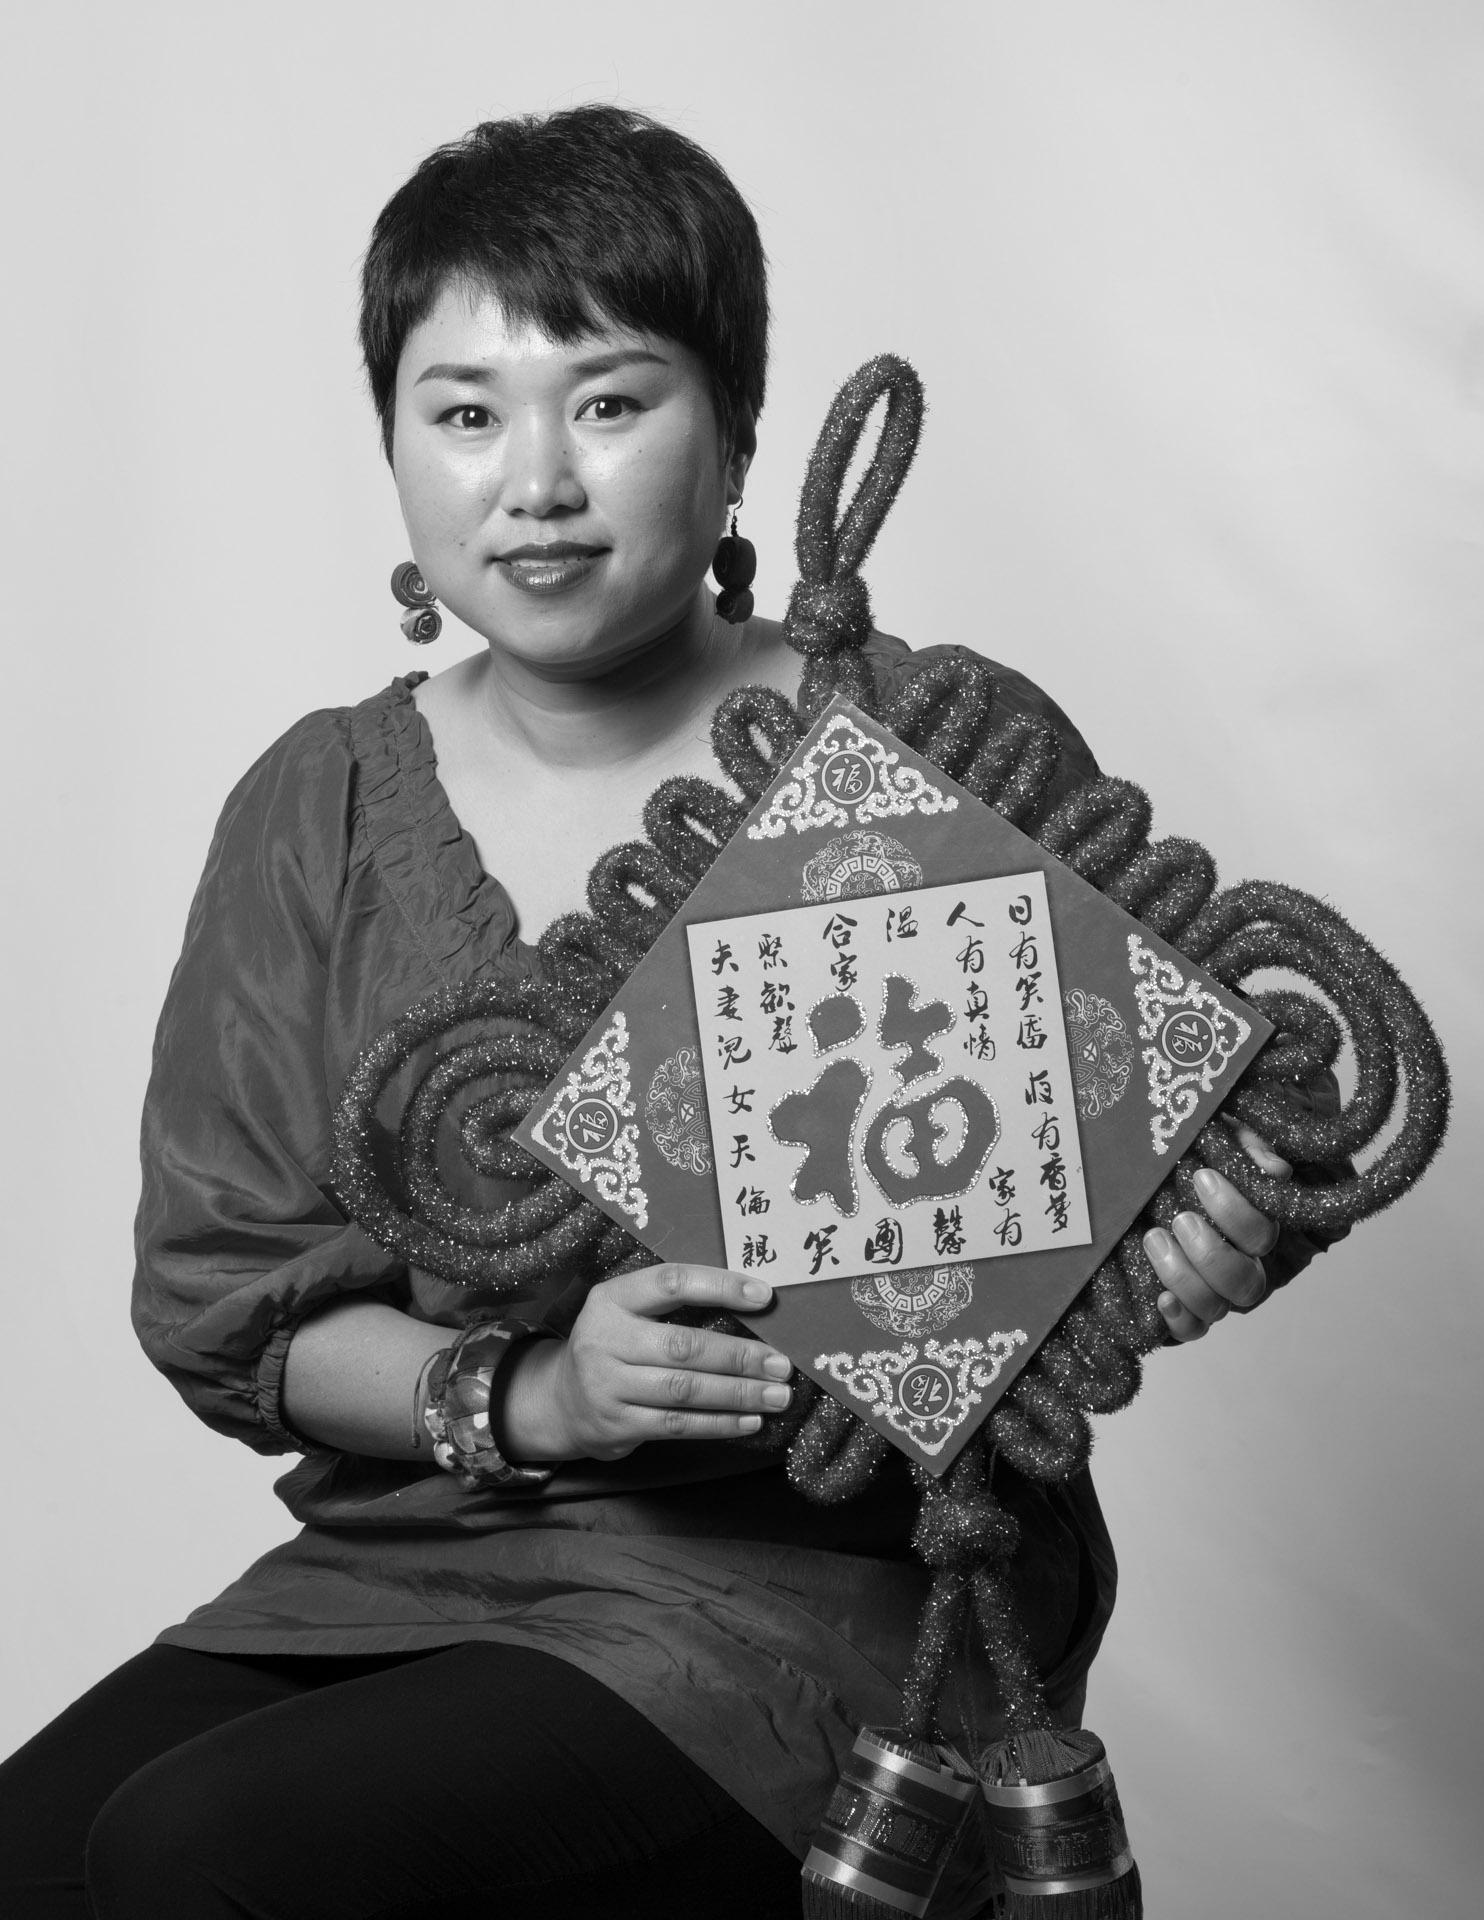 Angela, China